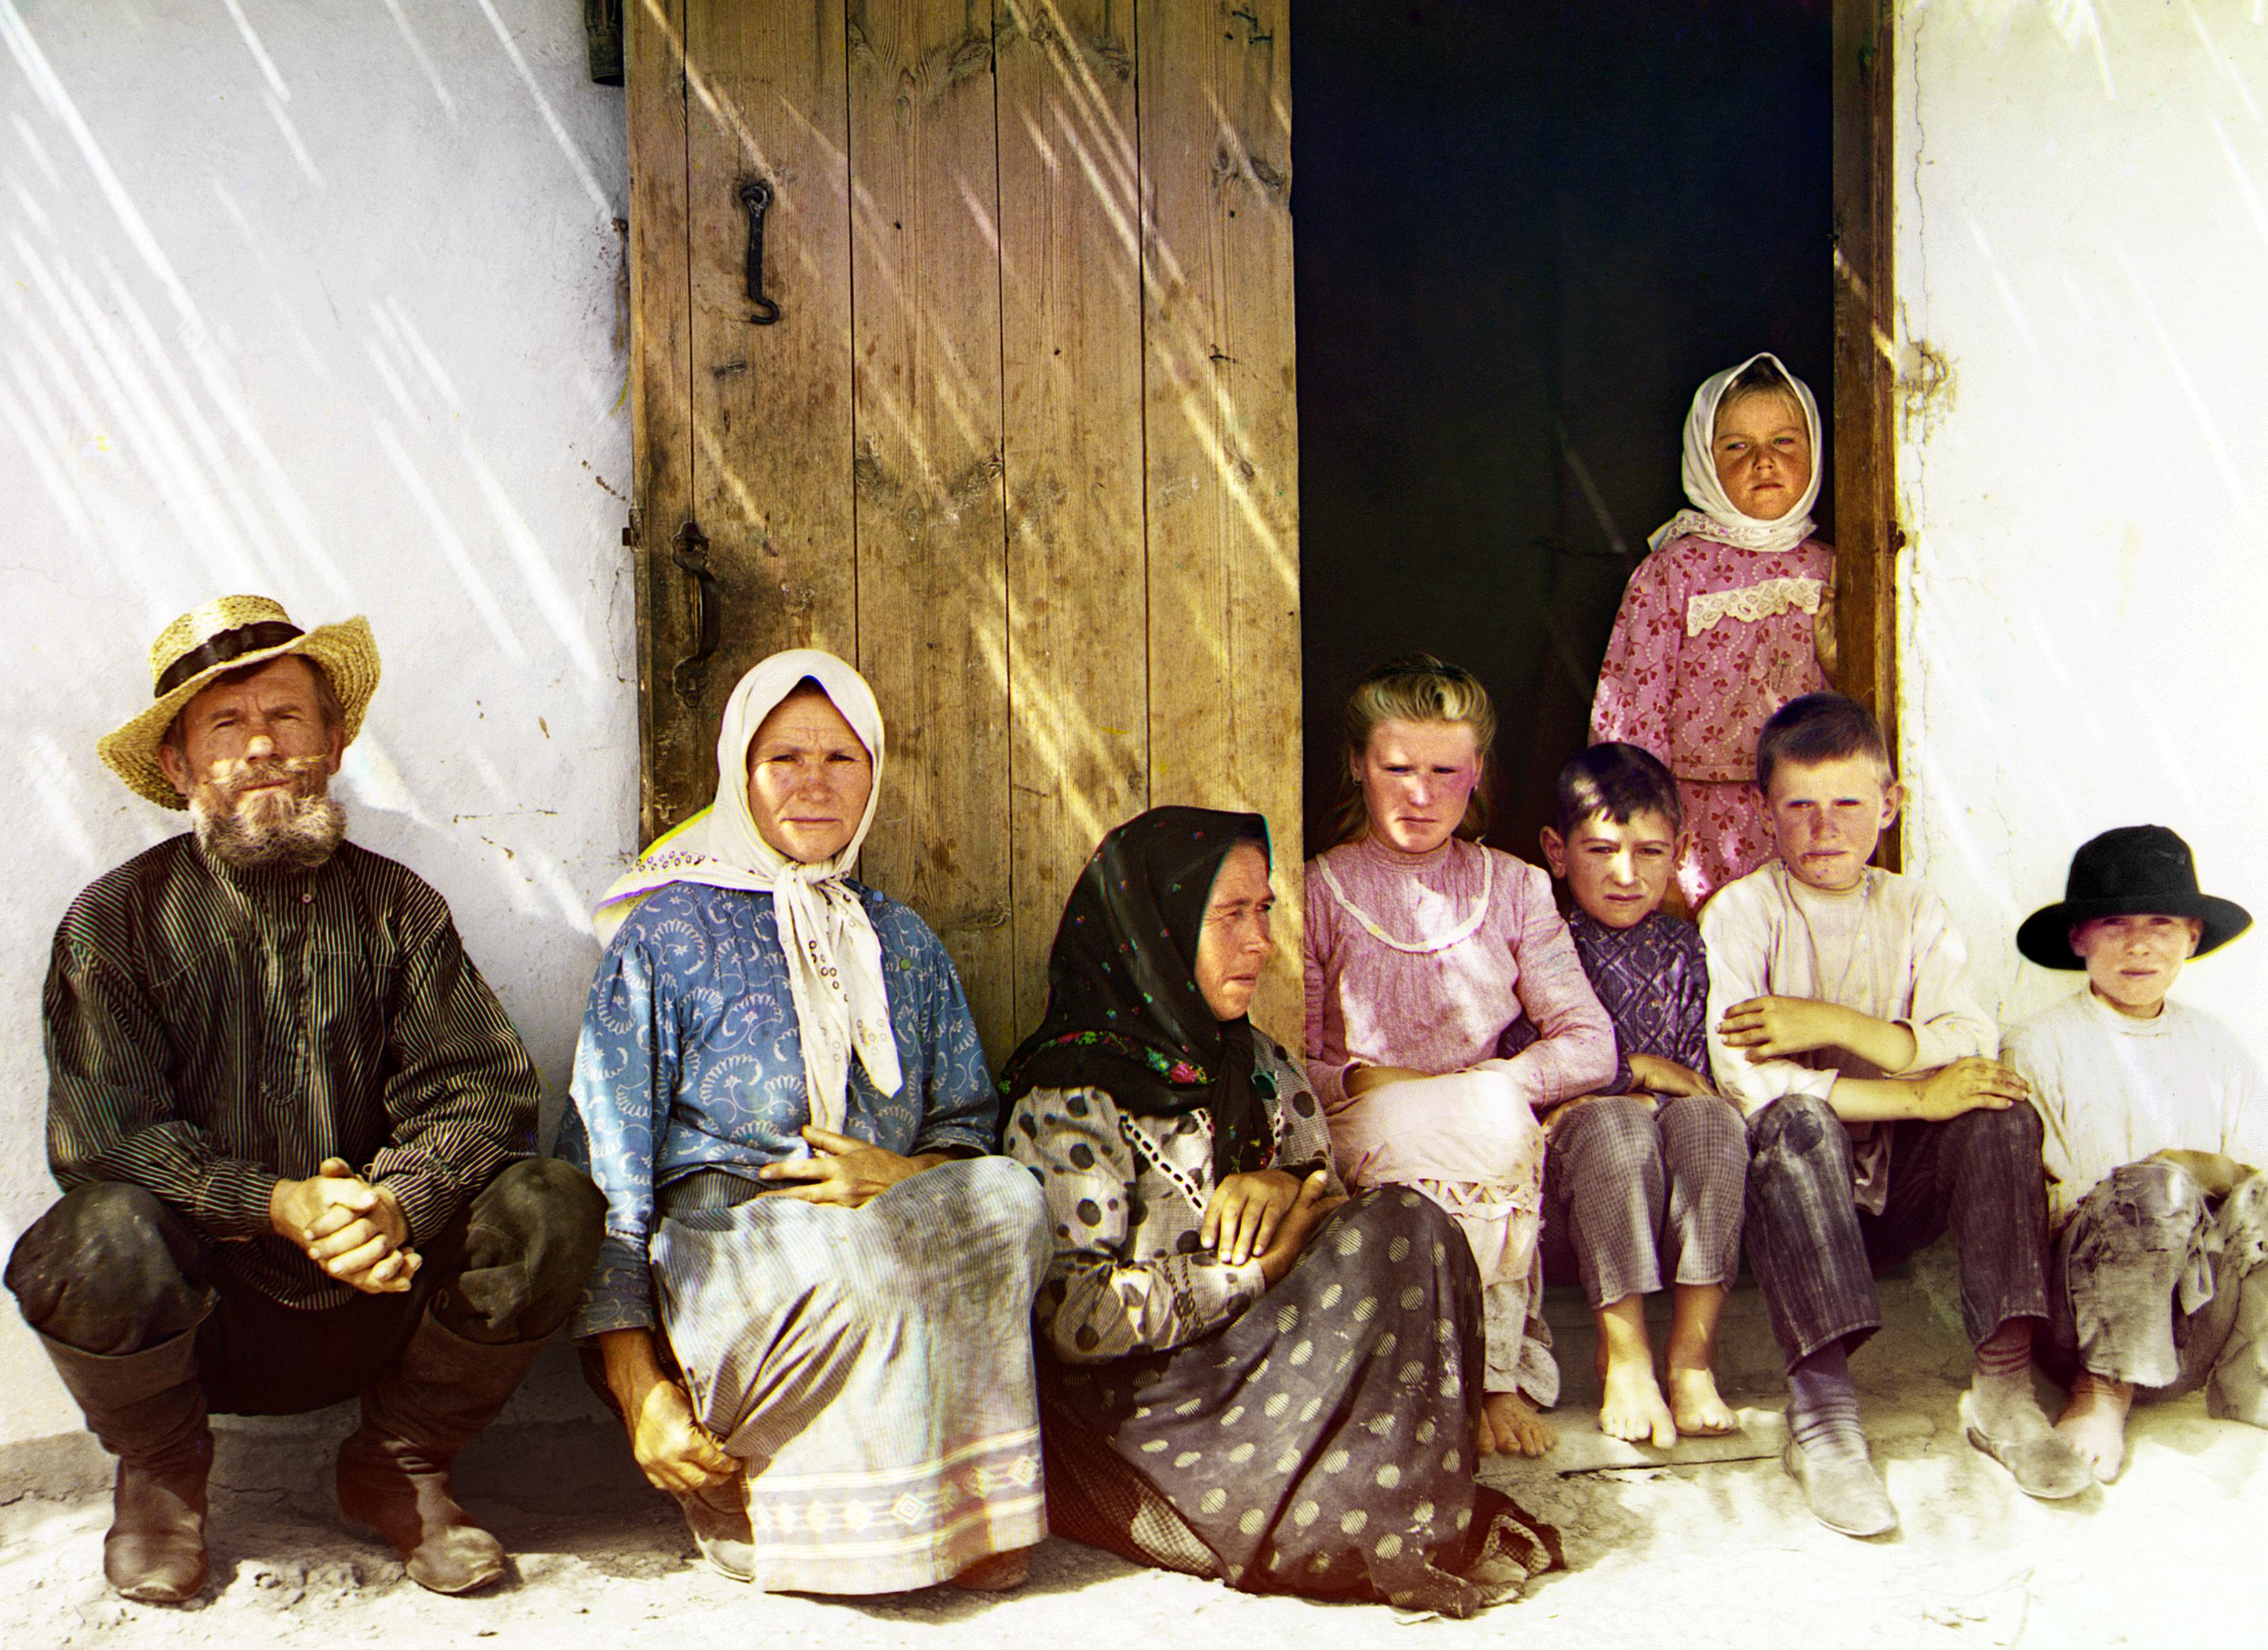 https://upload.wikimedia.org/wikipedia/commons/b/b8/Russian_settlers%2C_possibly_Molokans%2C_in_the_Mugan_steppe_of_Azerbaijan._Sergei_Mikhailovich_Prokudin-Gorskii.jpg